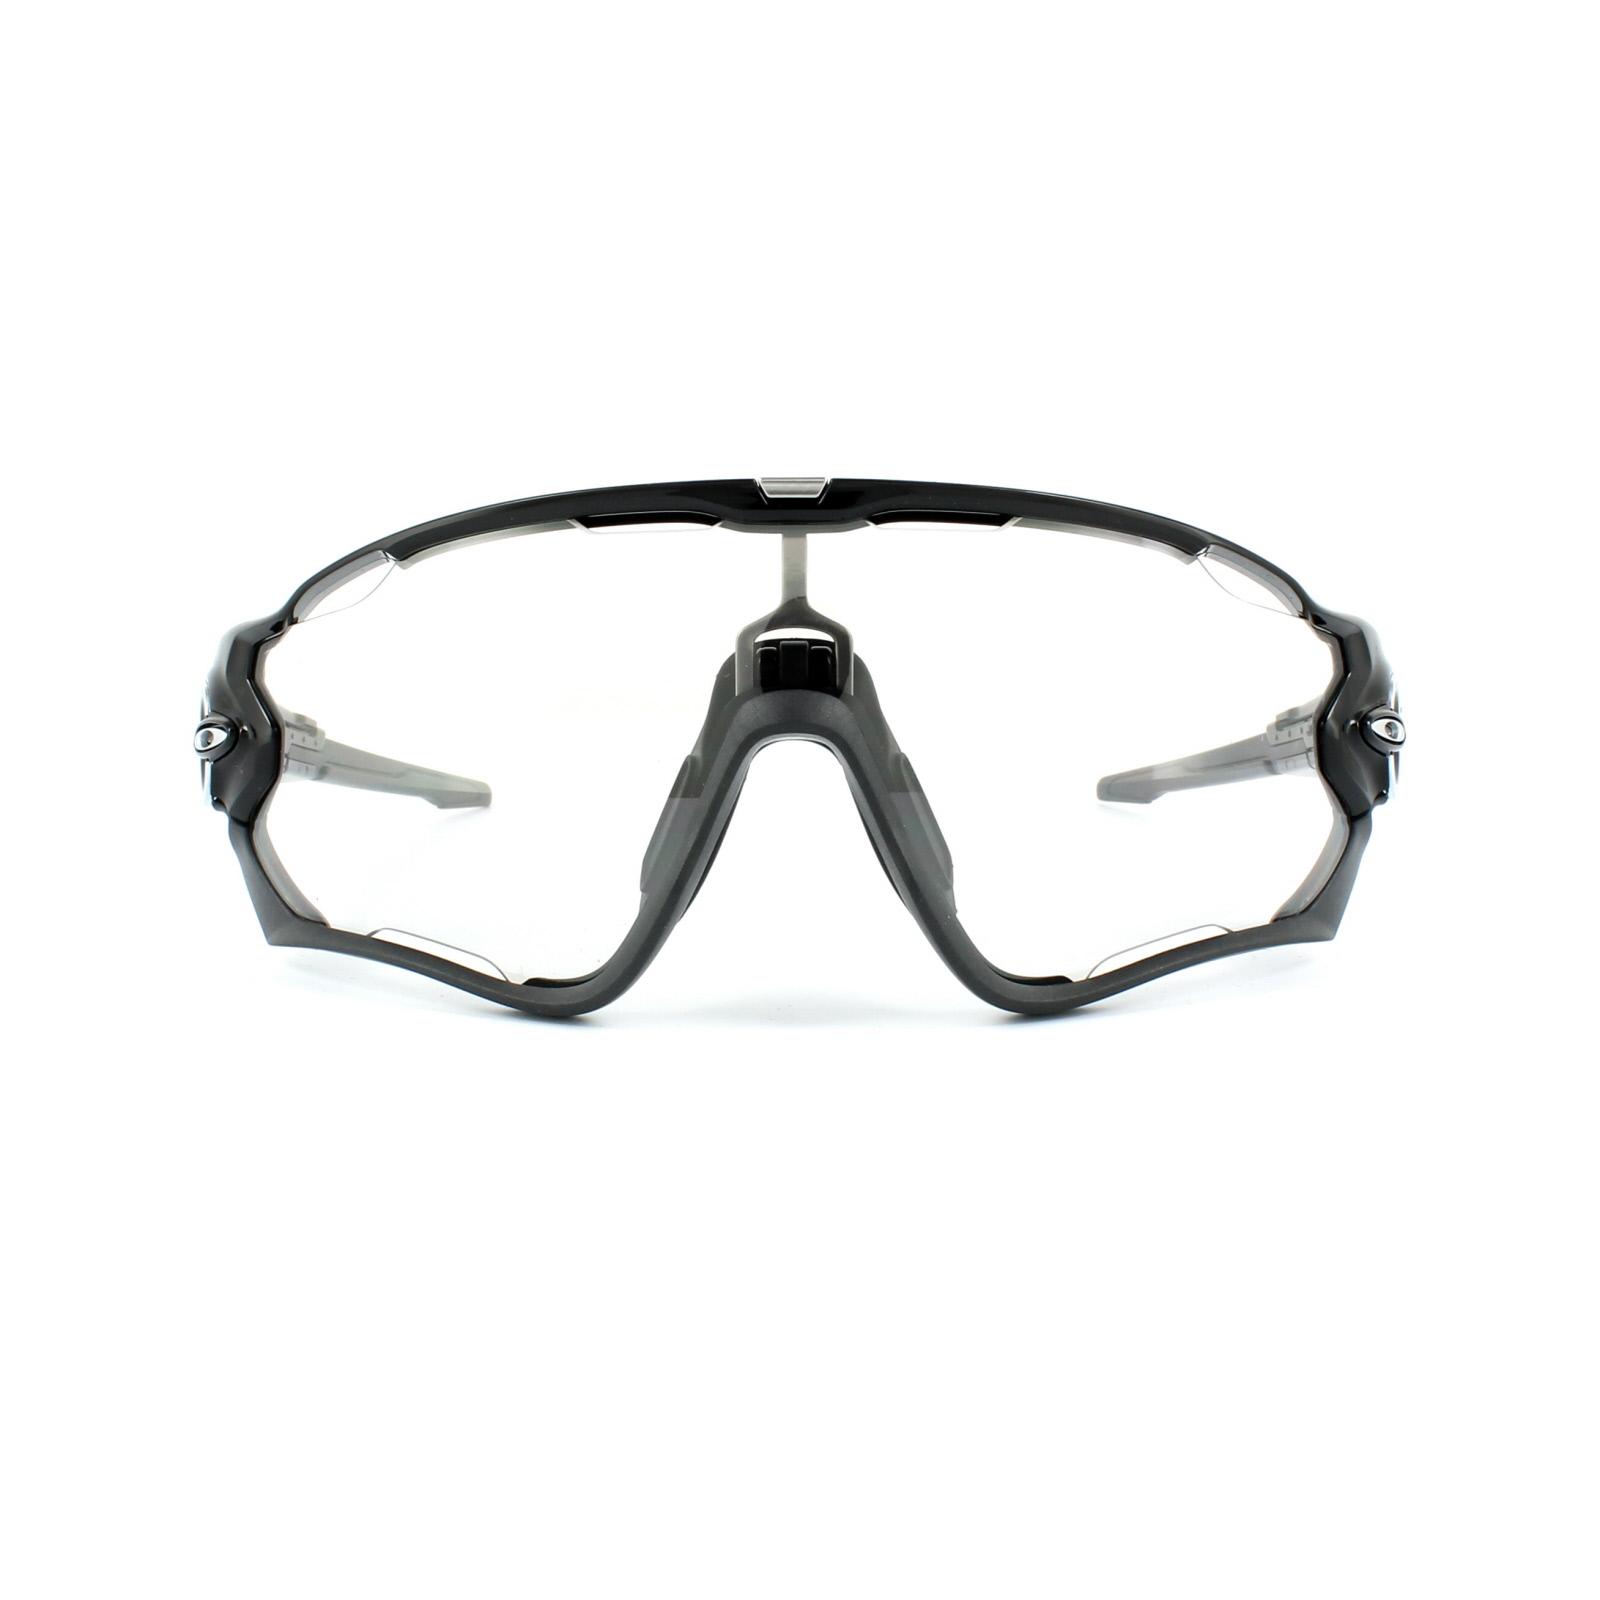 Oakley Gafas de sol JAWBREAKER oo9290-14 Negro Pulido Negro Claro ...